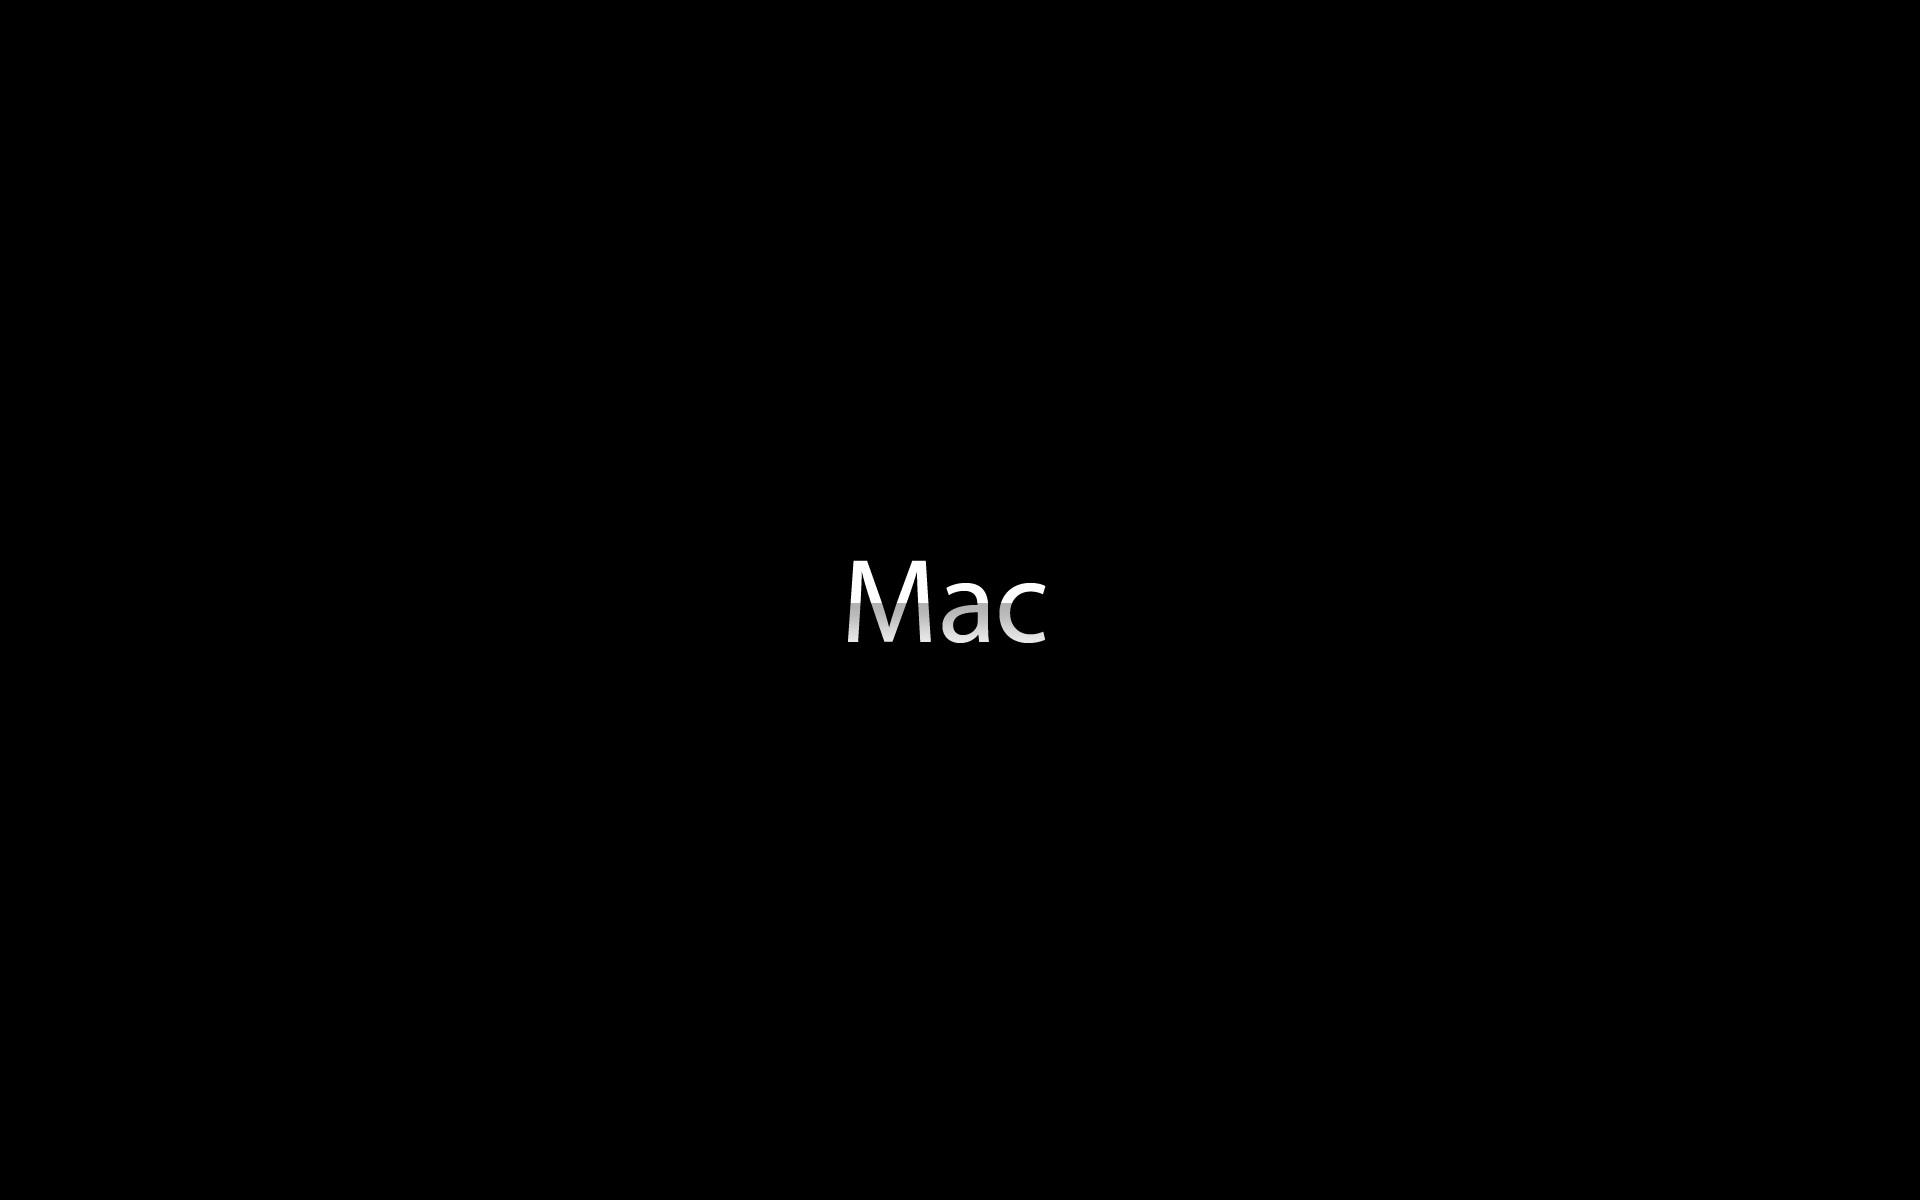 Minimalist Art Definition Fullscreenswide High Desktop Macs. SHARE. TAGS:  Fullscreen …